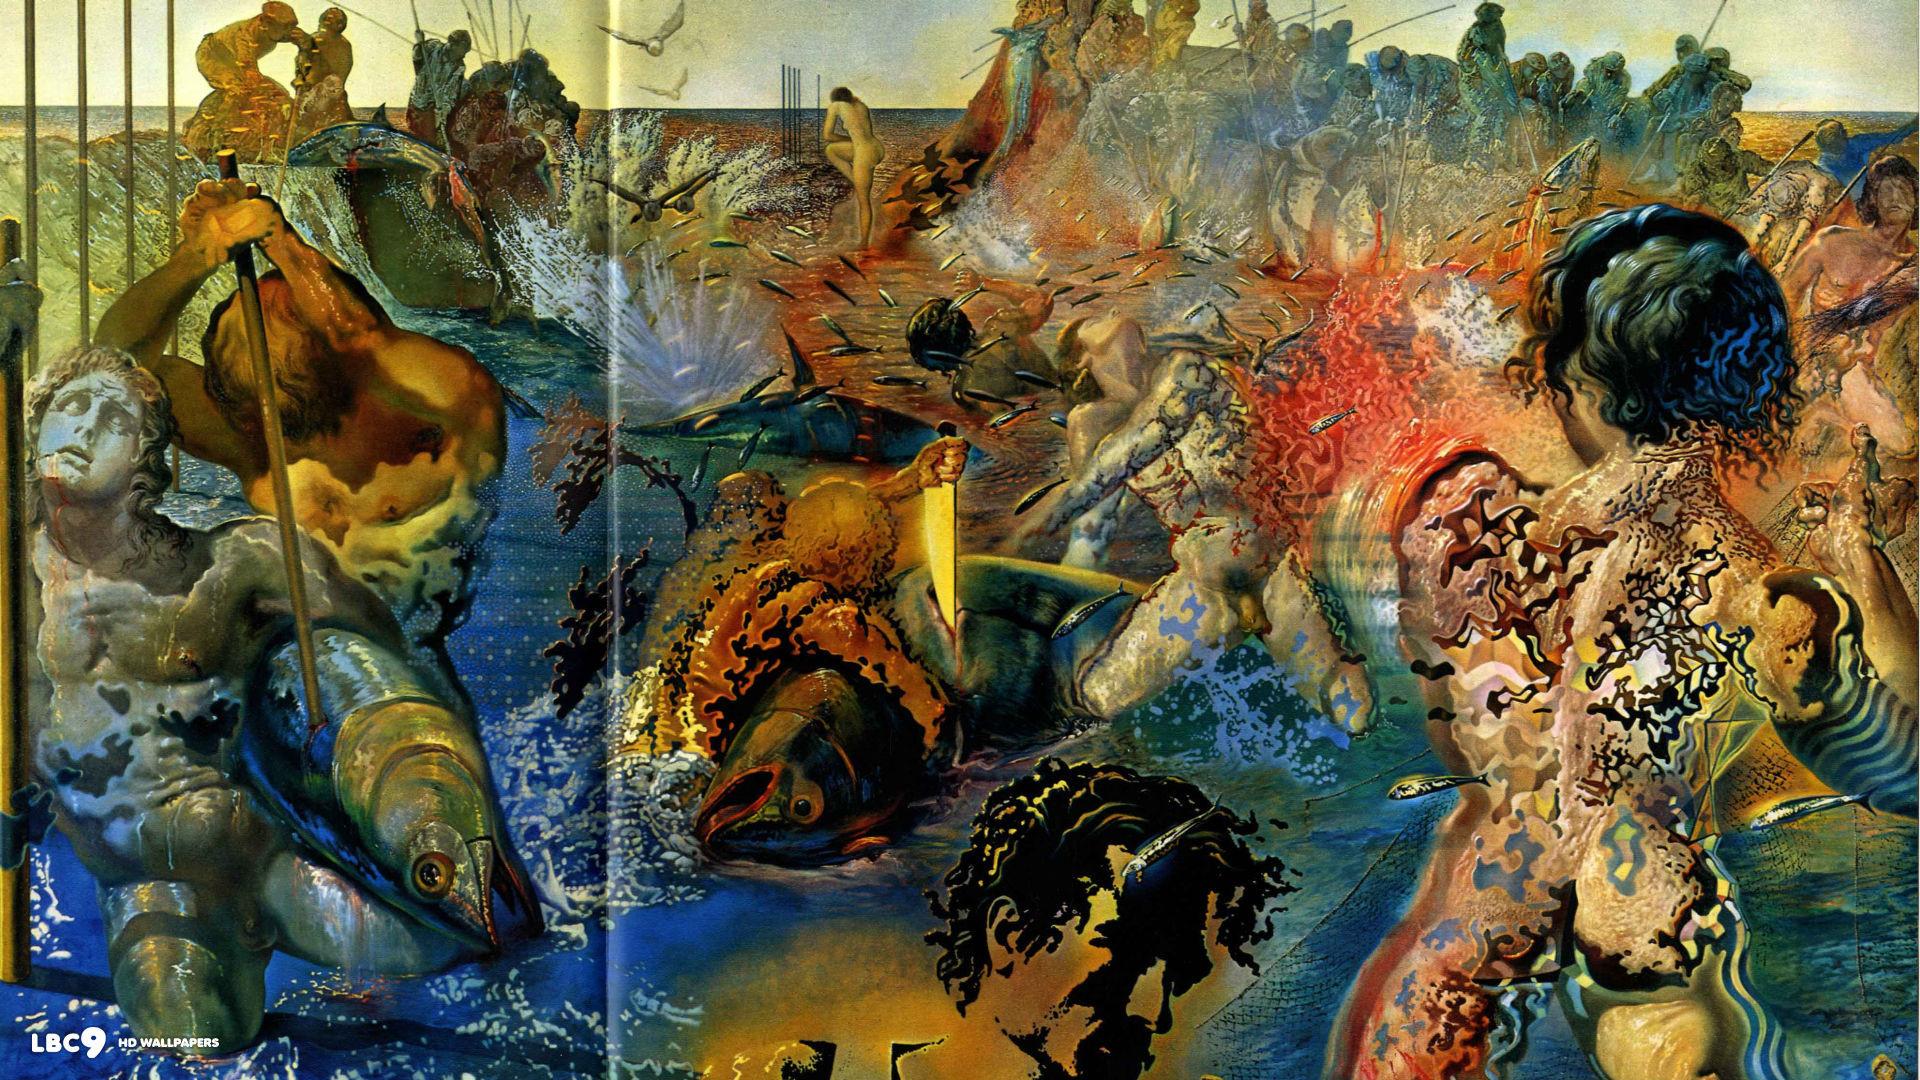 Salvador Dali Wallpapers 1080p 76 images